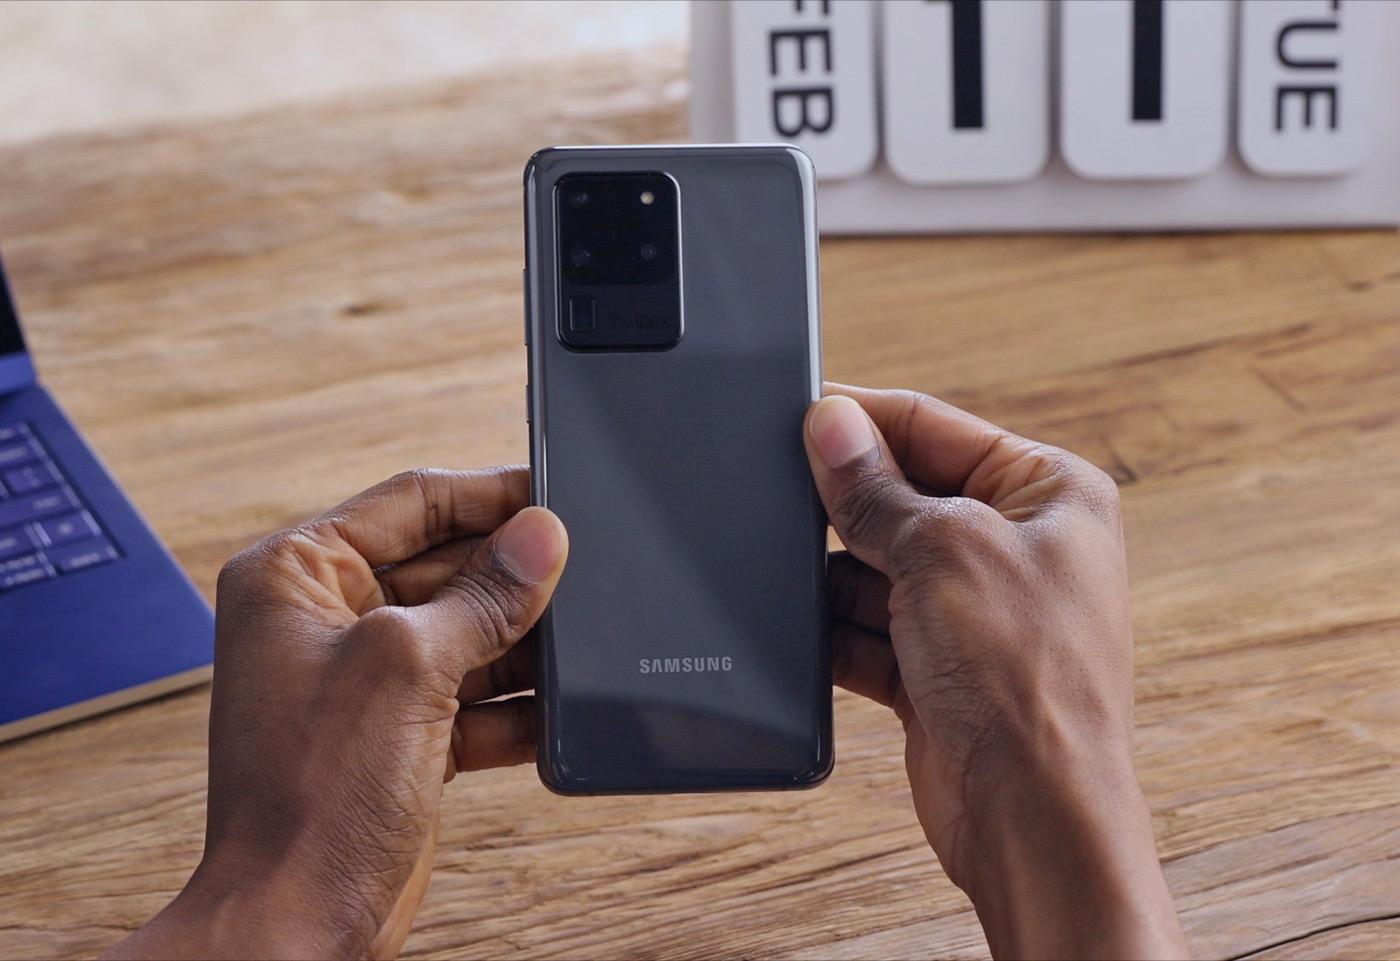 Galaxy Unpacked 2020 - Galaxy s20 Ultra